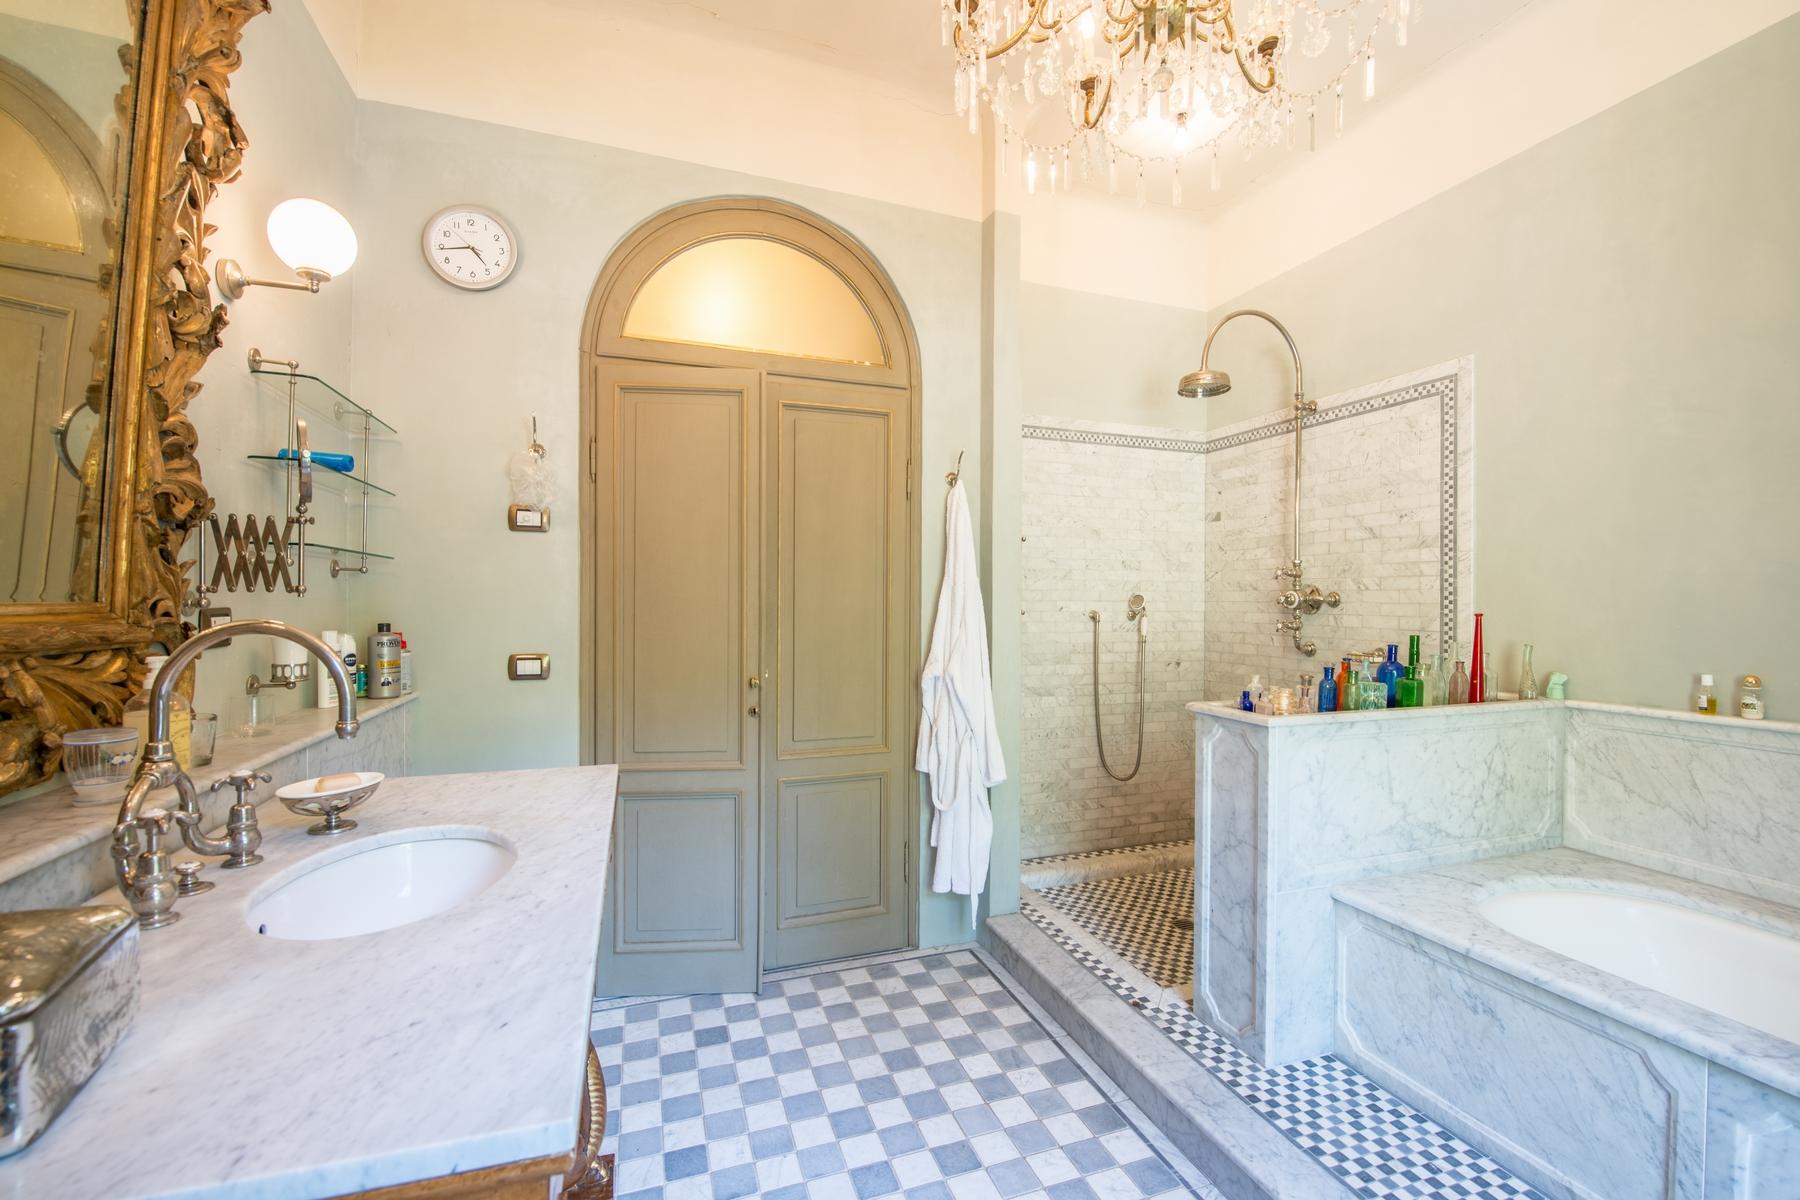 Villa in Vendita a Lucca: 5 locali, 2500 mq - Foto 9